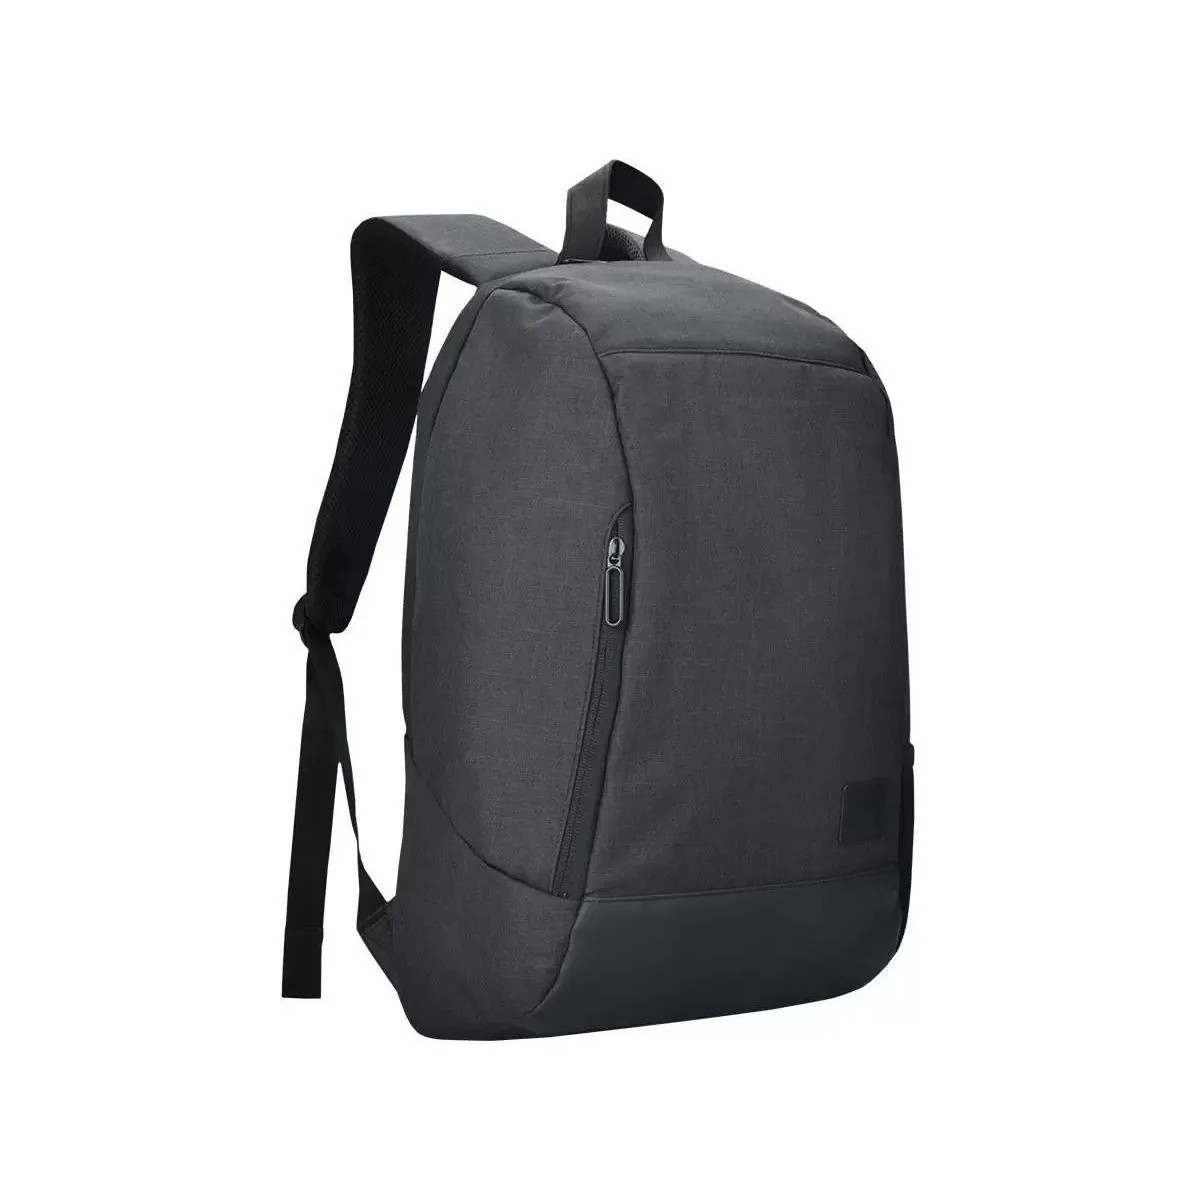 Mochila Antifurto Swisspack Para Notebook 15.6' Bo426